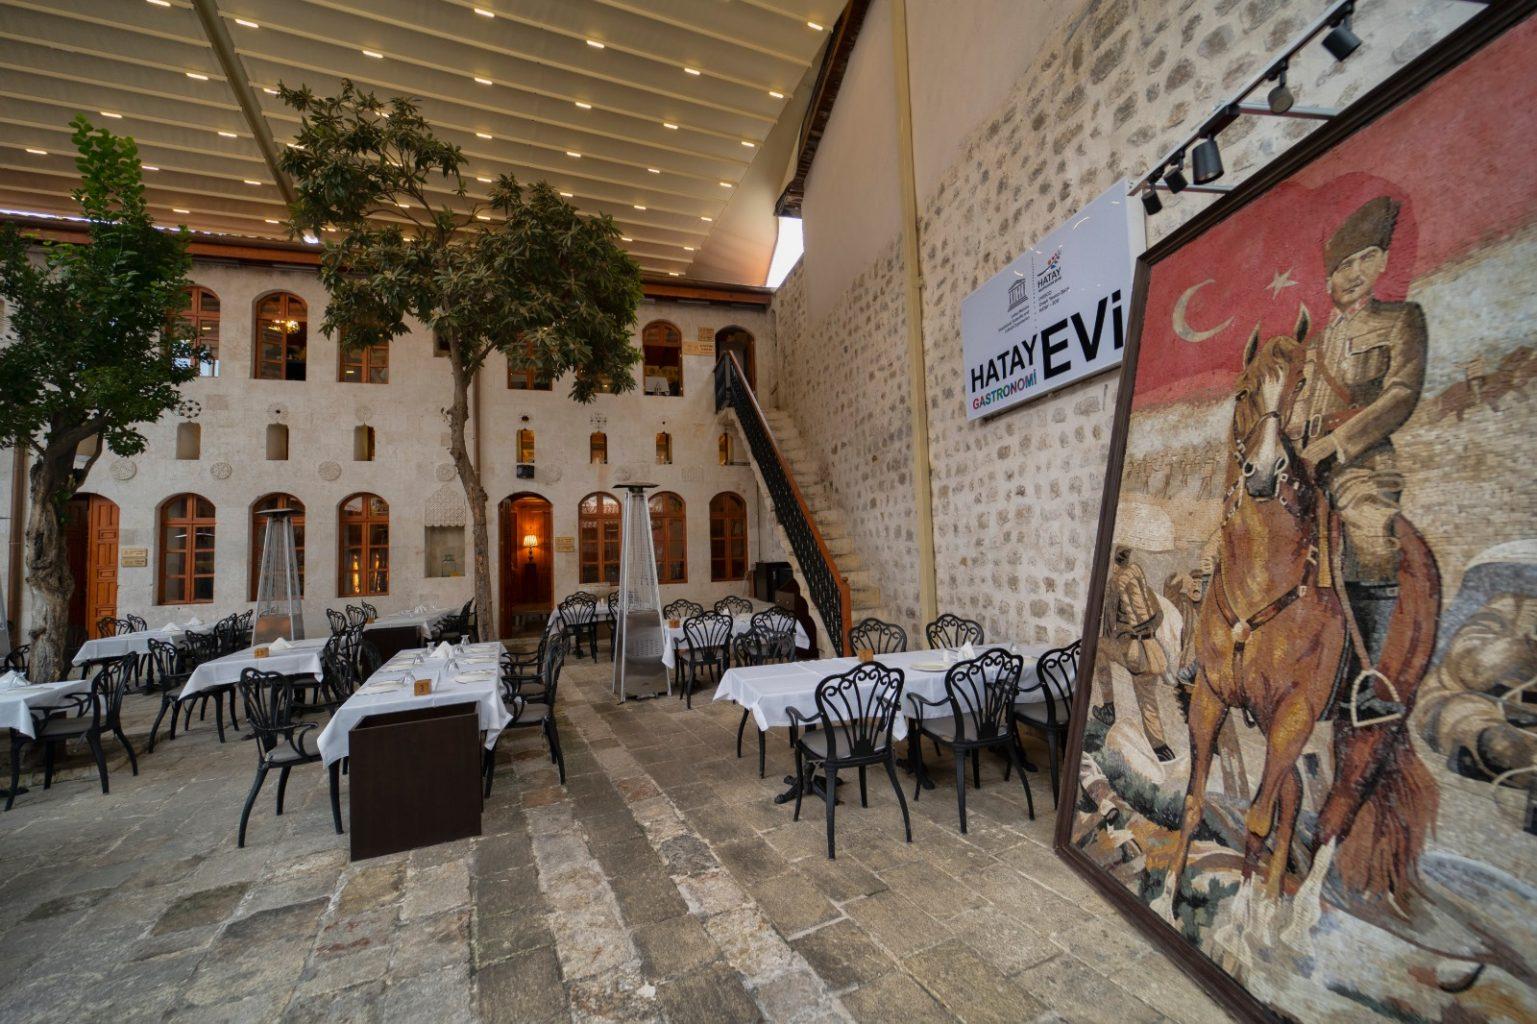 Hatay Gastronomi Evi model oldu ozelkalem.com .tr